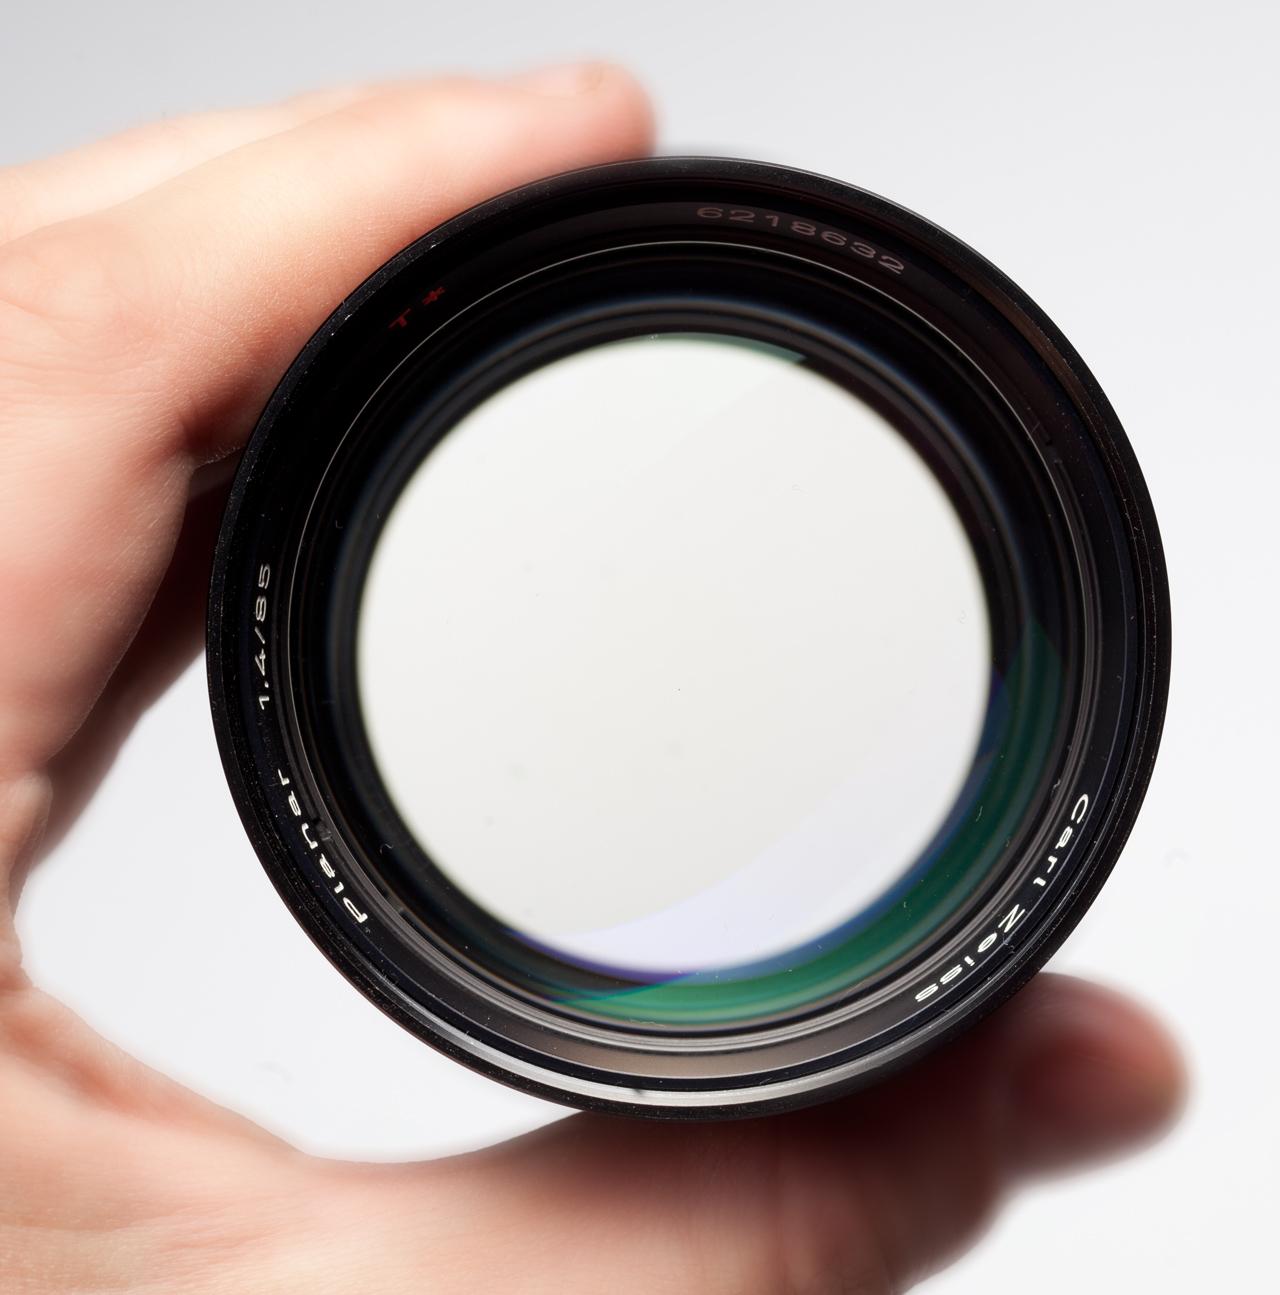 German Carl Zeiss Planar 85/1.4 with aperture wide-open (F1.4)